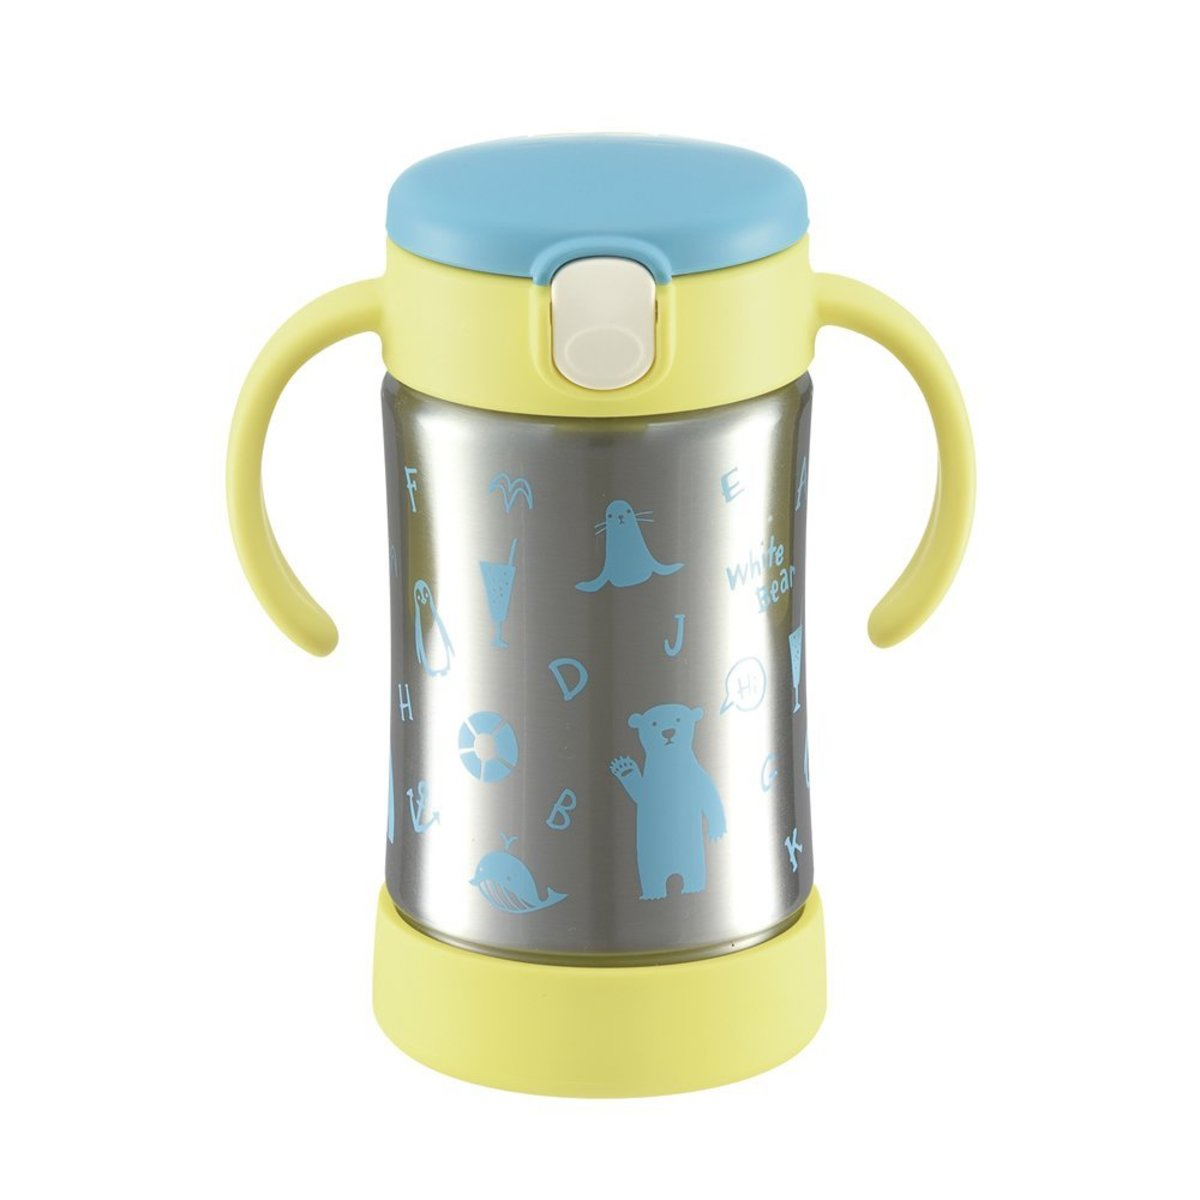 RICHELL保溫不銹鋼飲管杯 300ml (粉藍色)